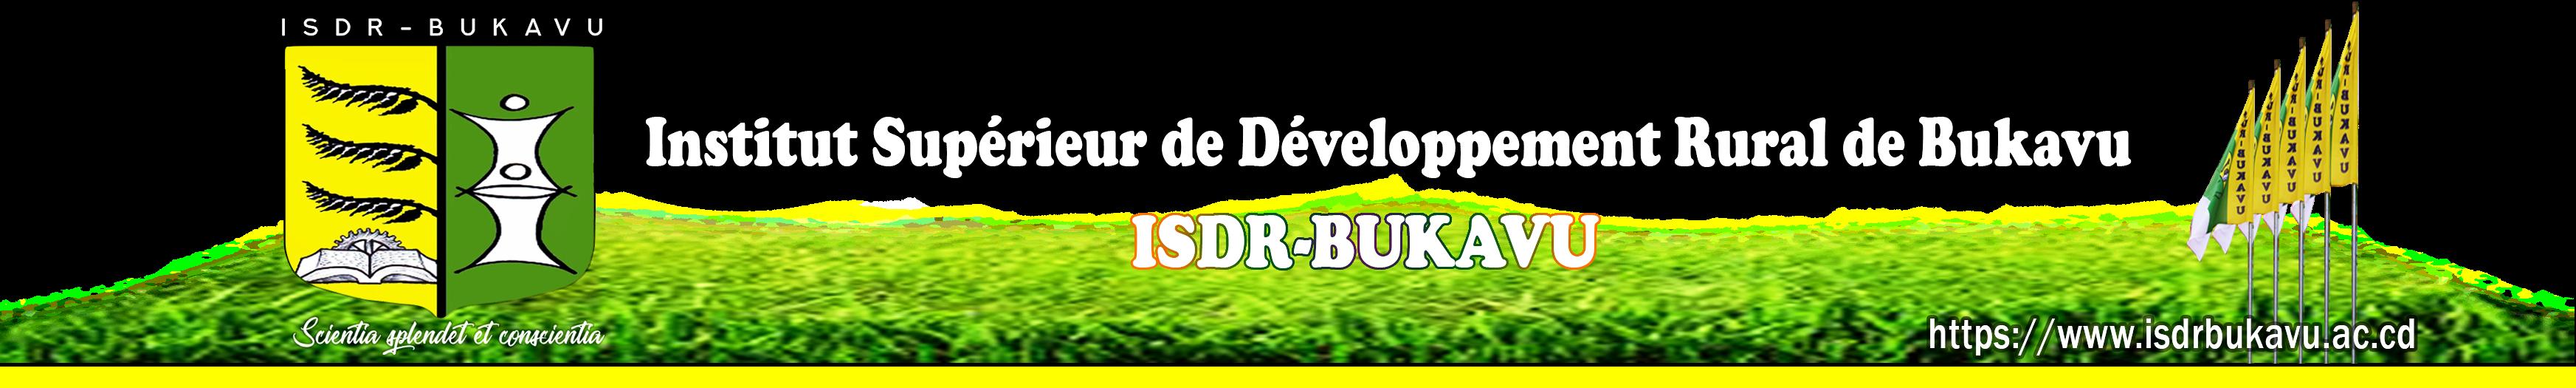 ISDR-BUKAVU